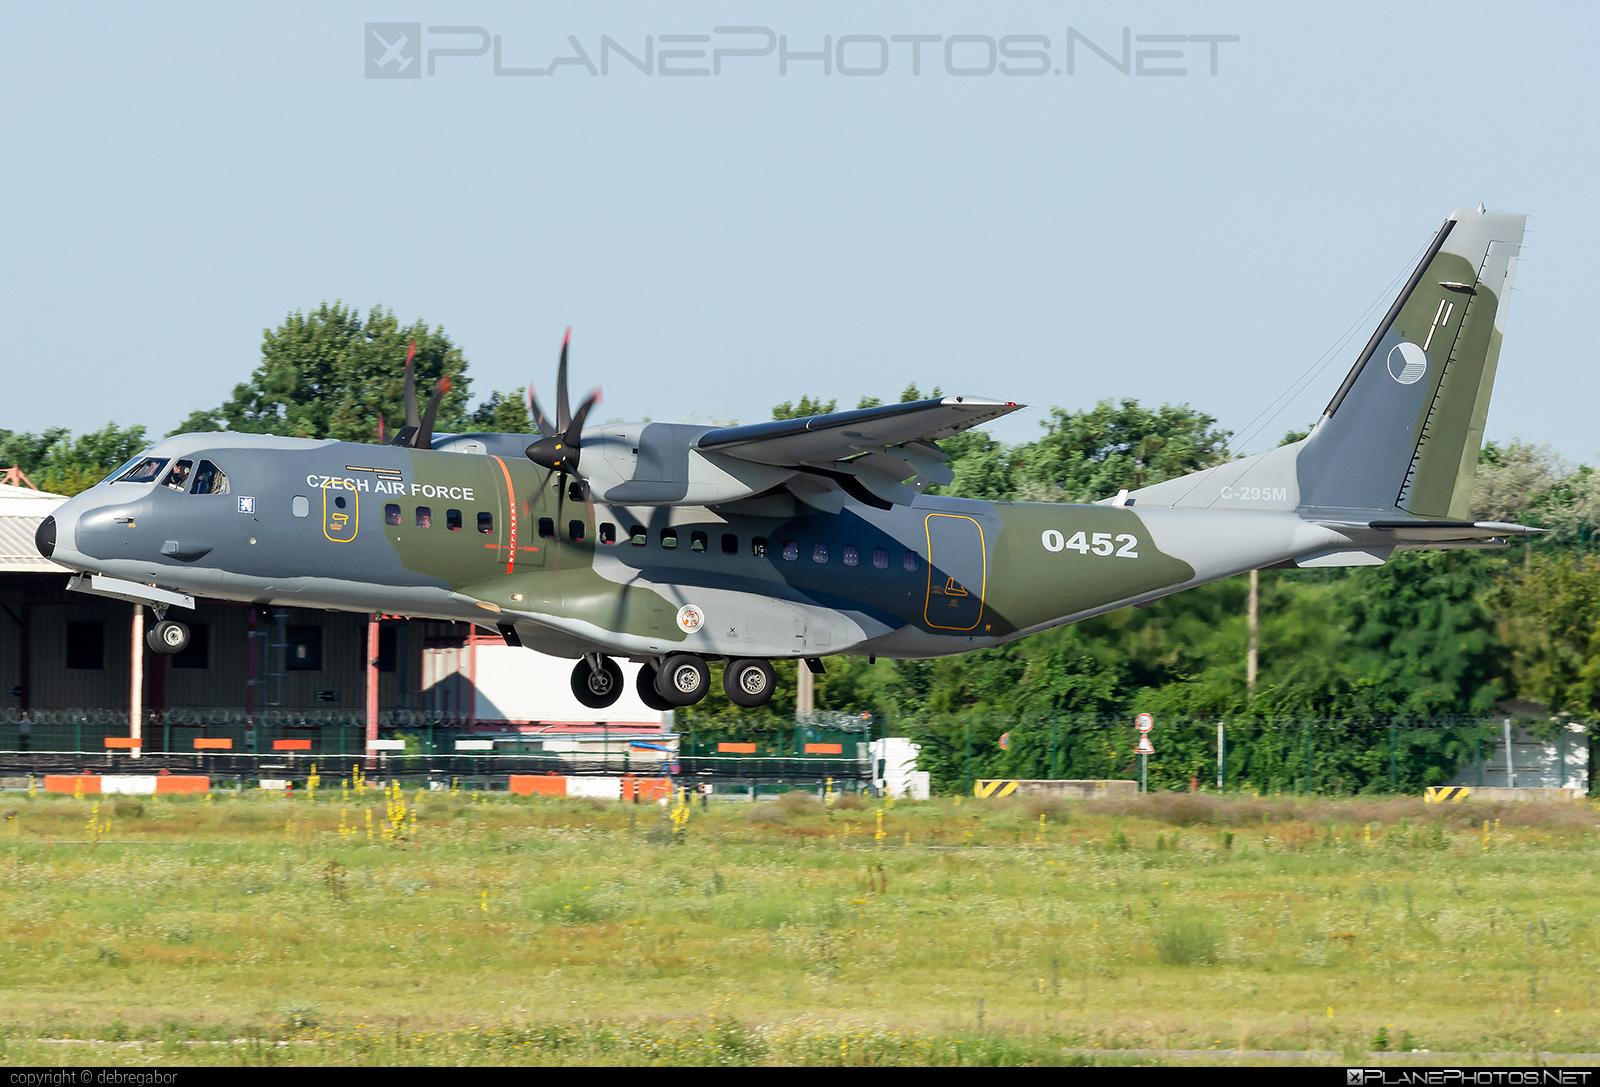 CASA 295M - 0452 operated by Vzdušné síly AČR (Czech Air Force) #casa #casa295 #casa295m #czechairforce #vzdusnesilyacr